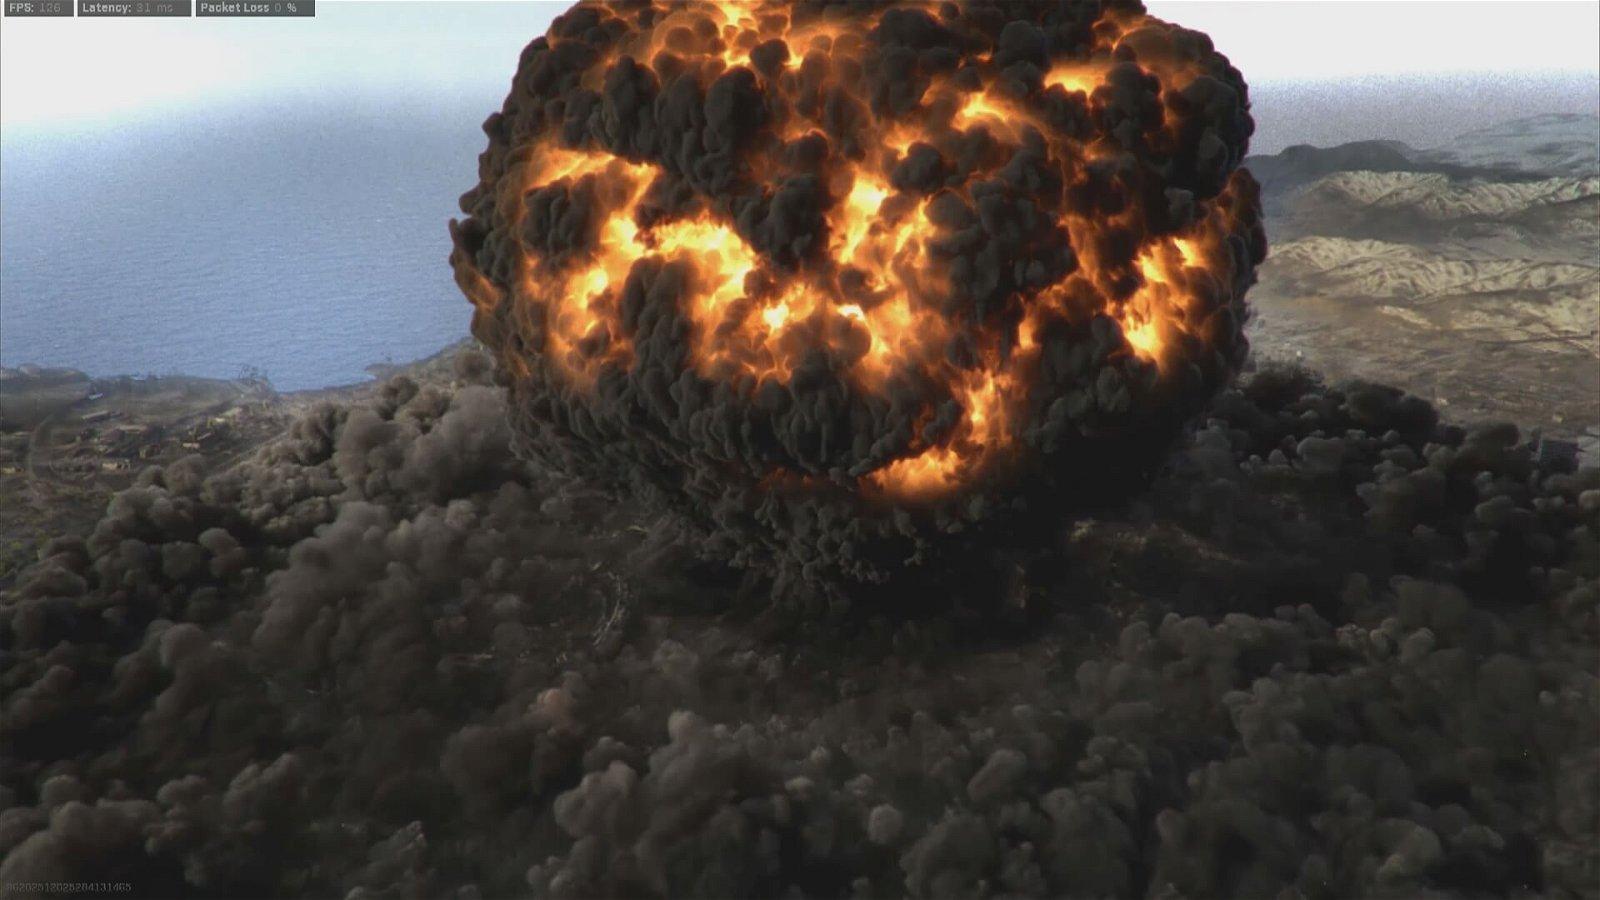 Call of Duty — Verdansk Gets Nuked!